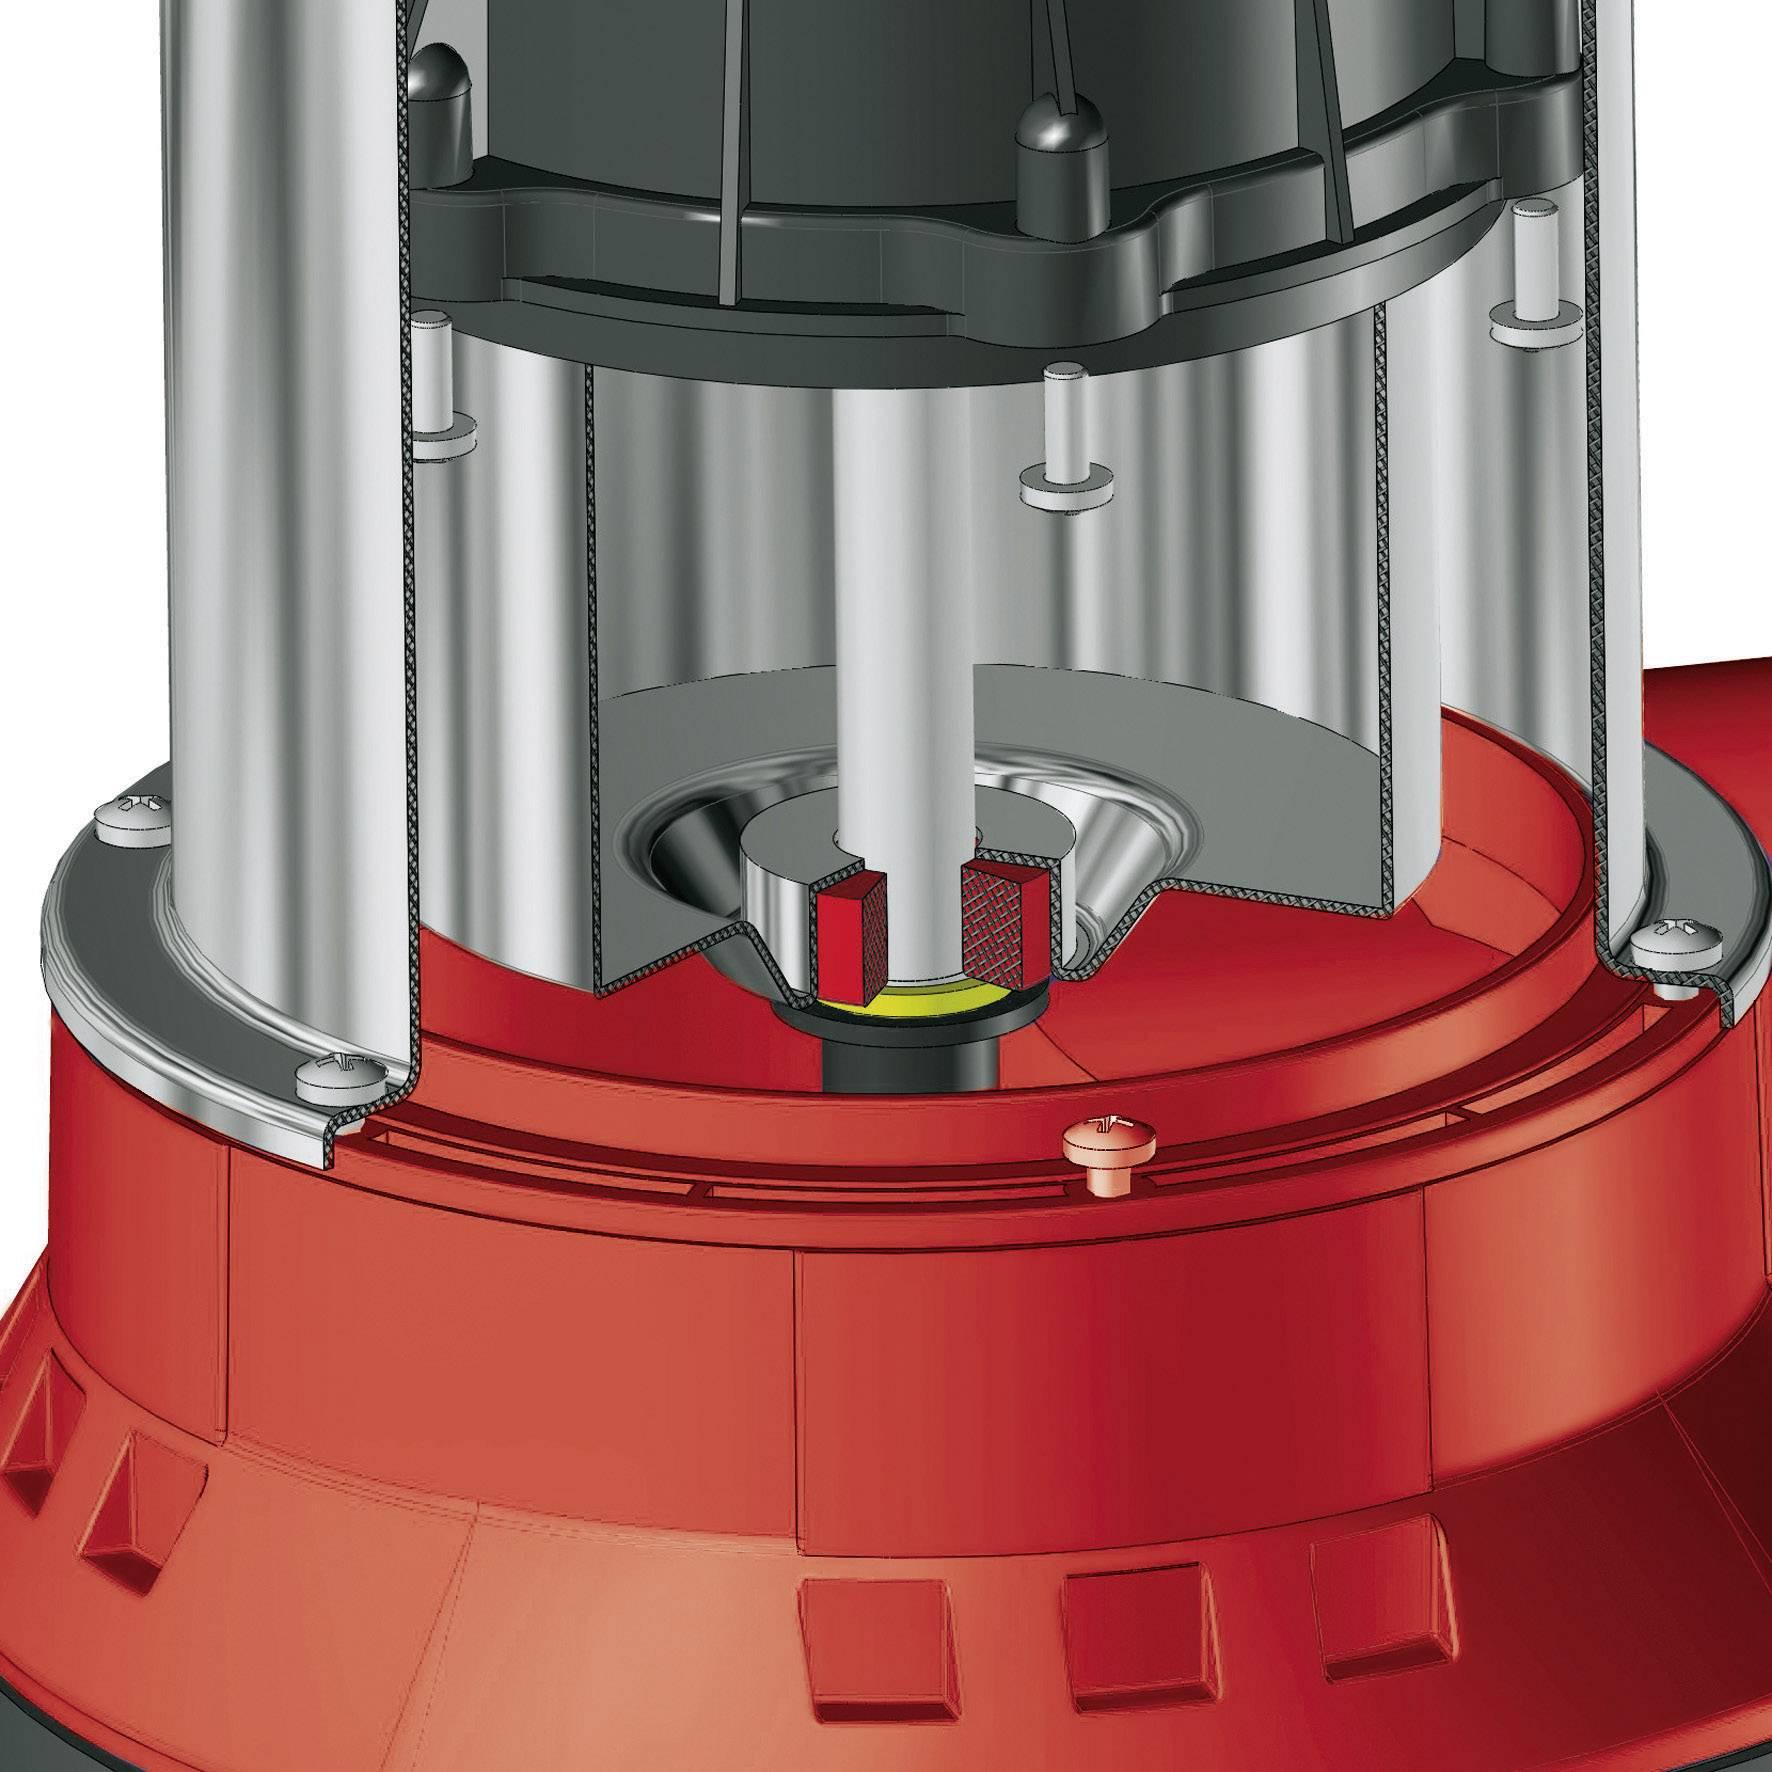 Kalové čerpadlo Einhell GH-DP 6315 N, 17000 l/h, výtlak do 8 m